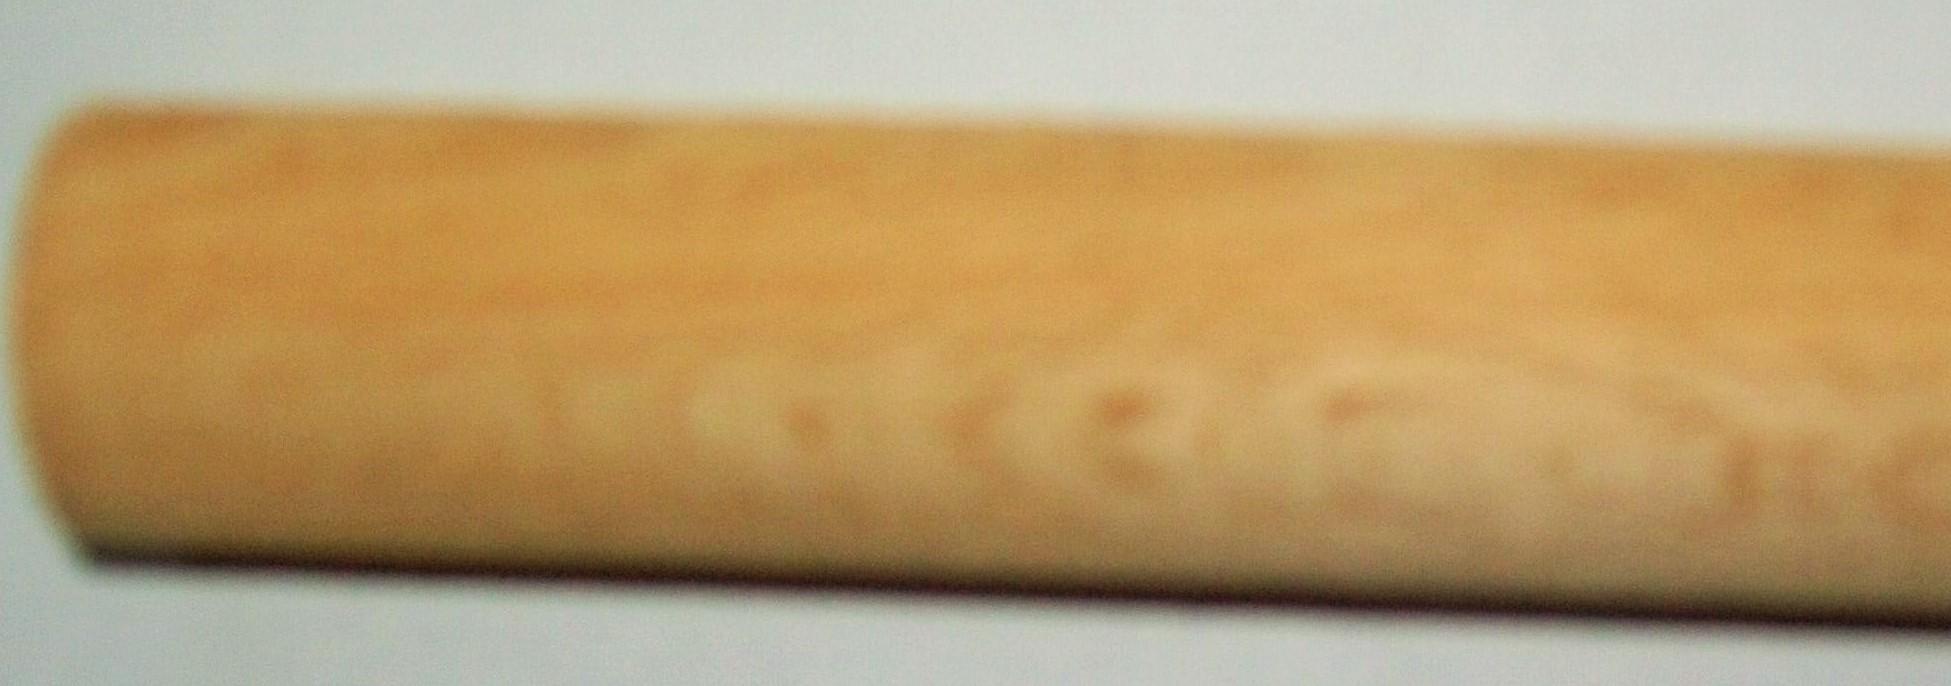 Kij trzonek trzon bez gwintu 120-25 szt